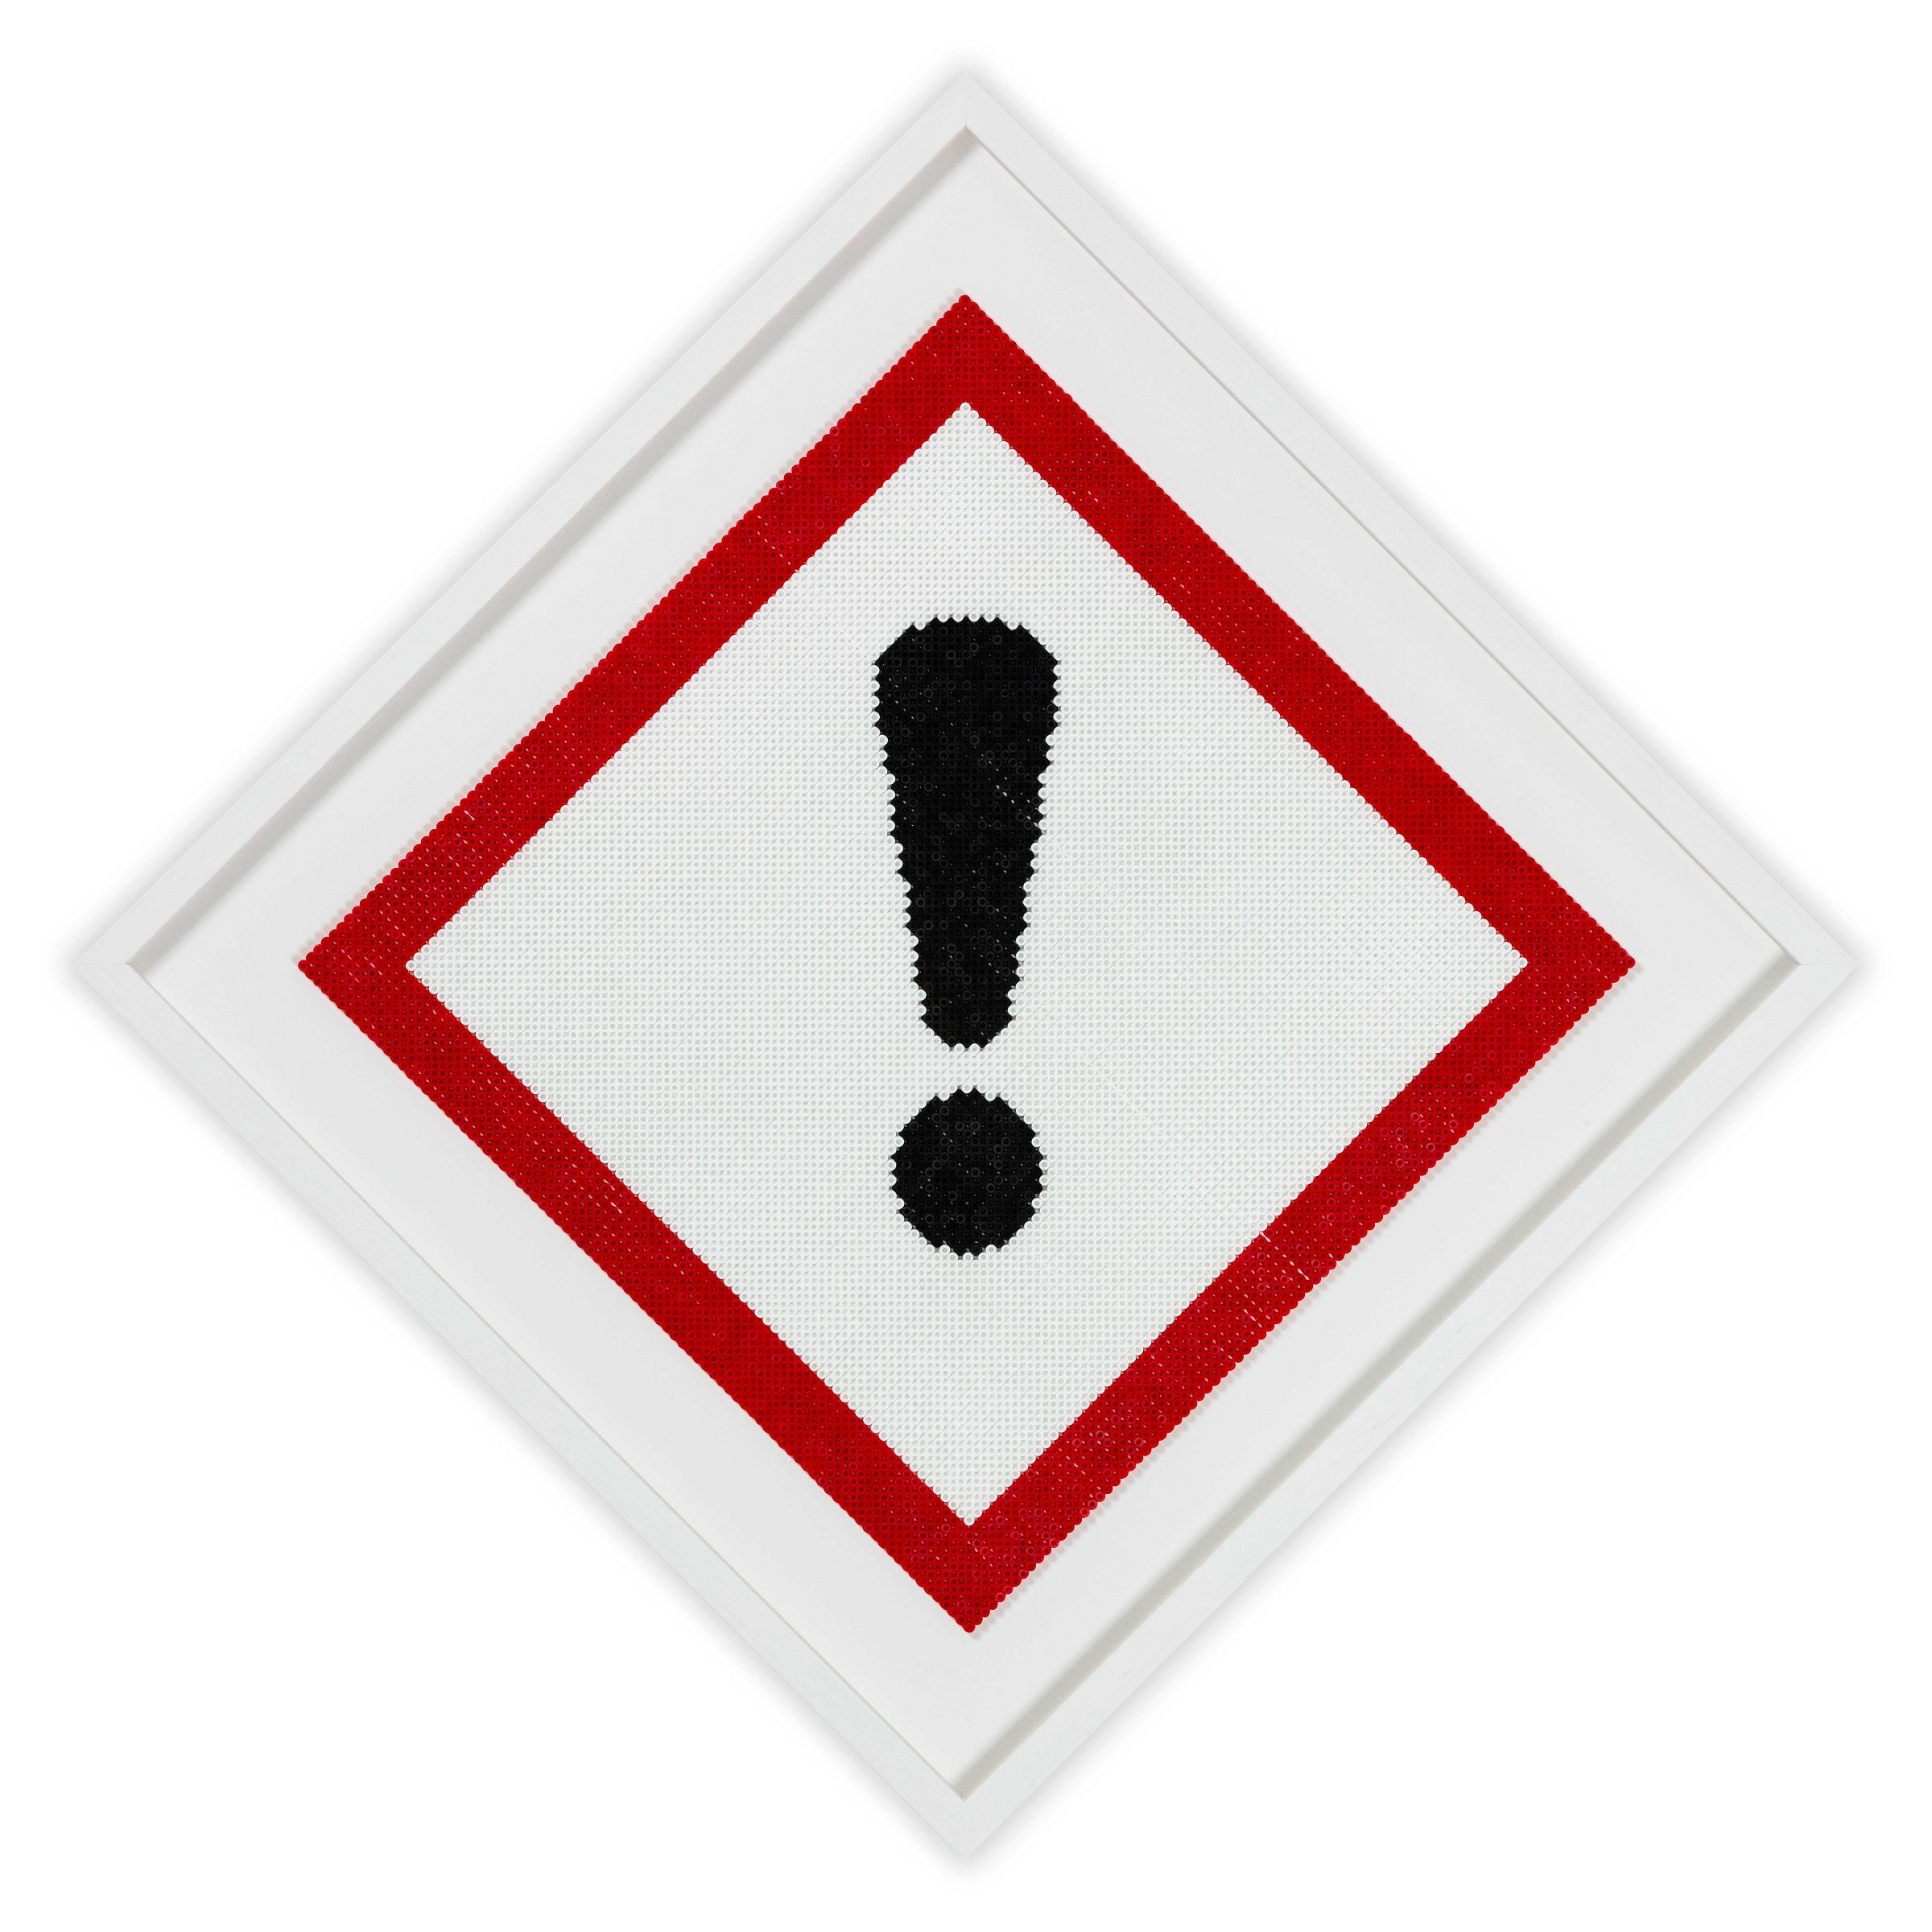 PLASTIC WARNING SIGN 1/4 – 2020